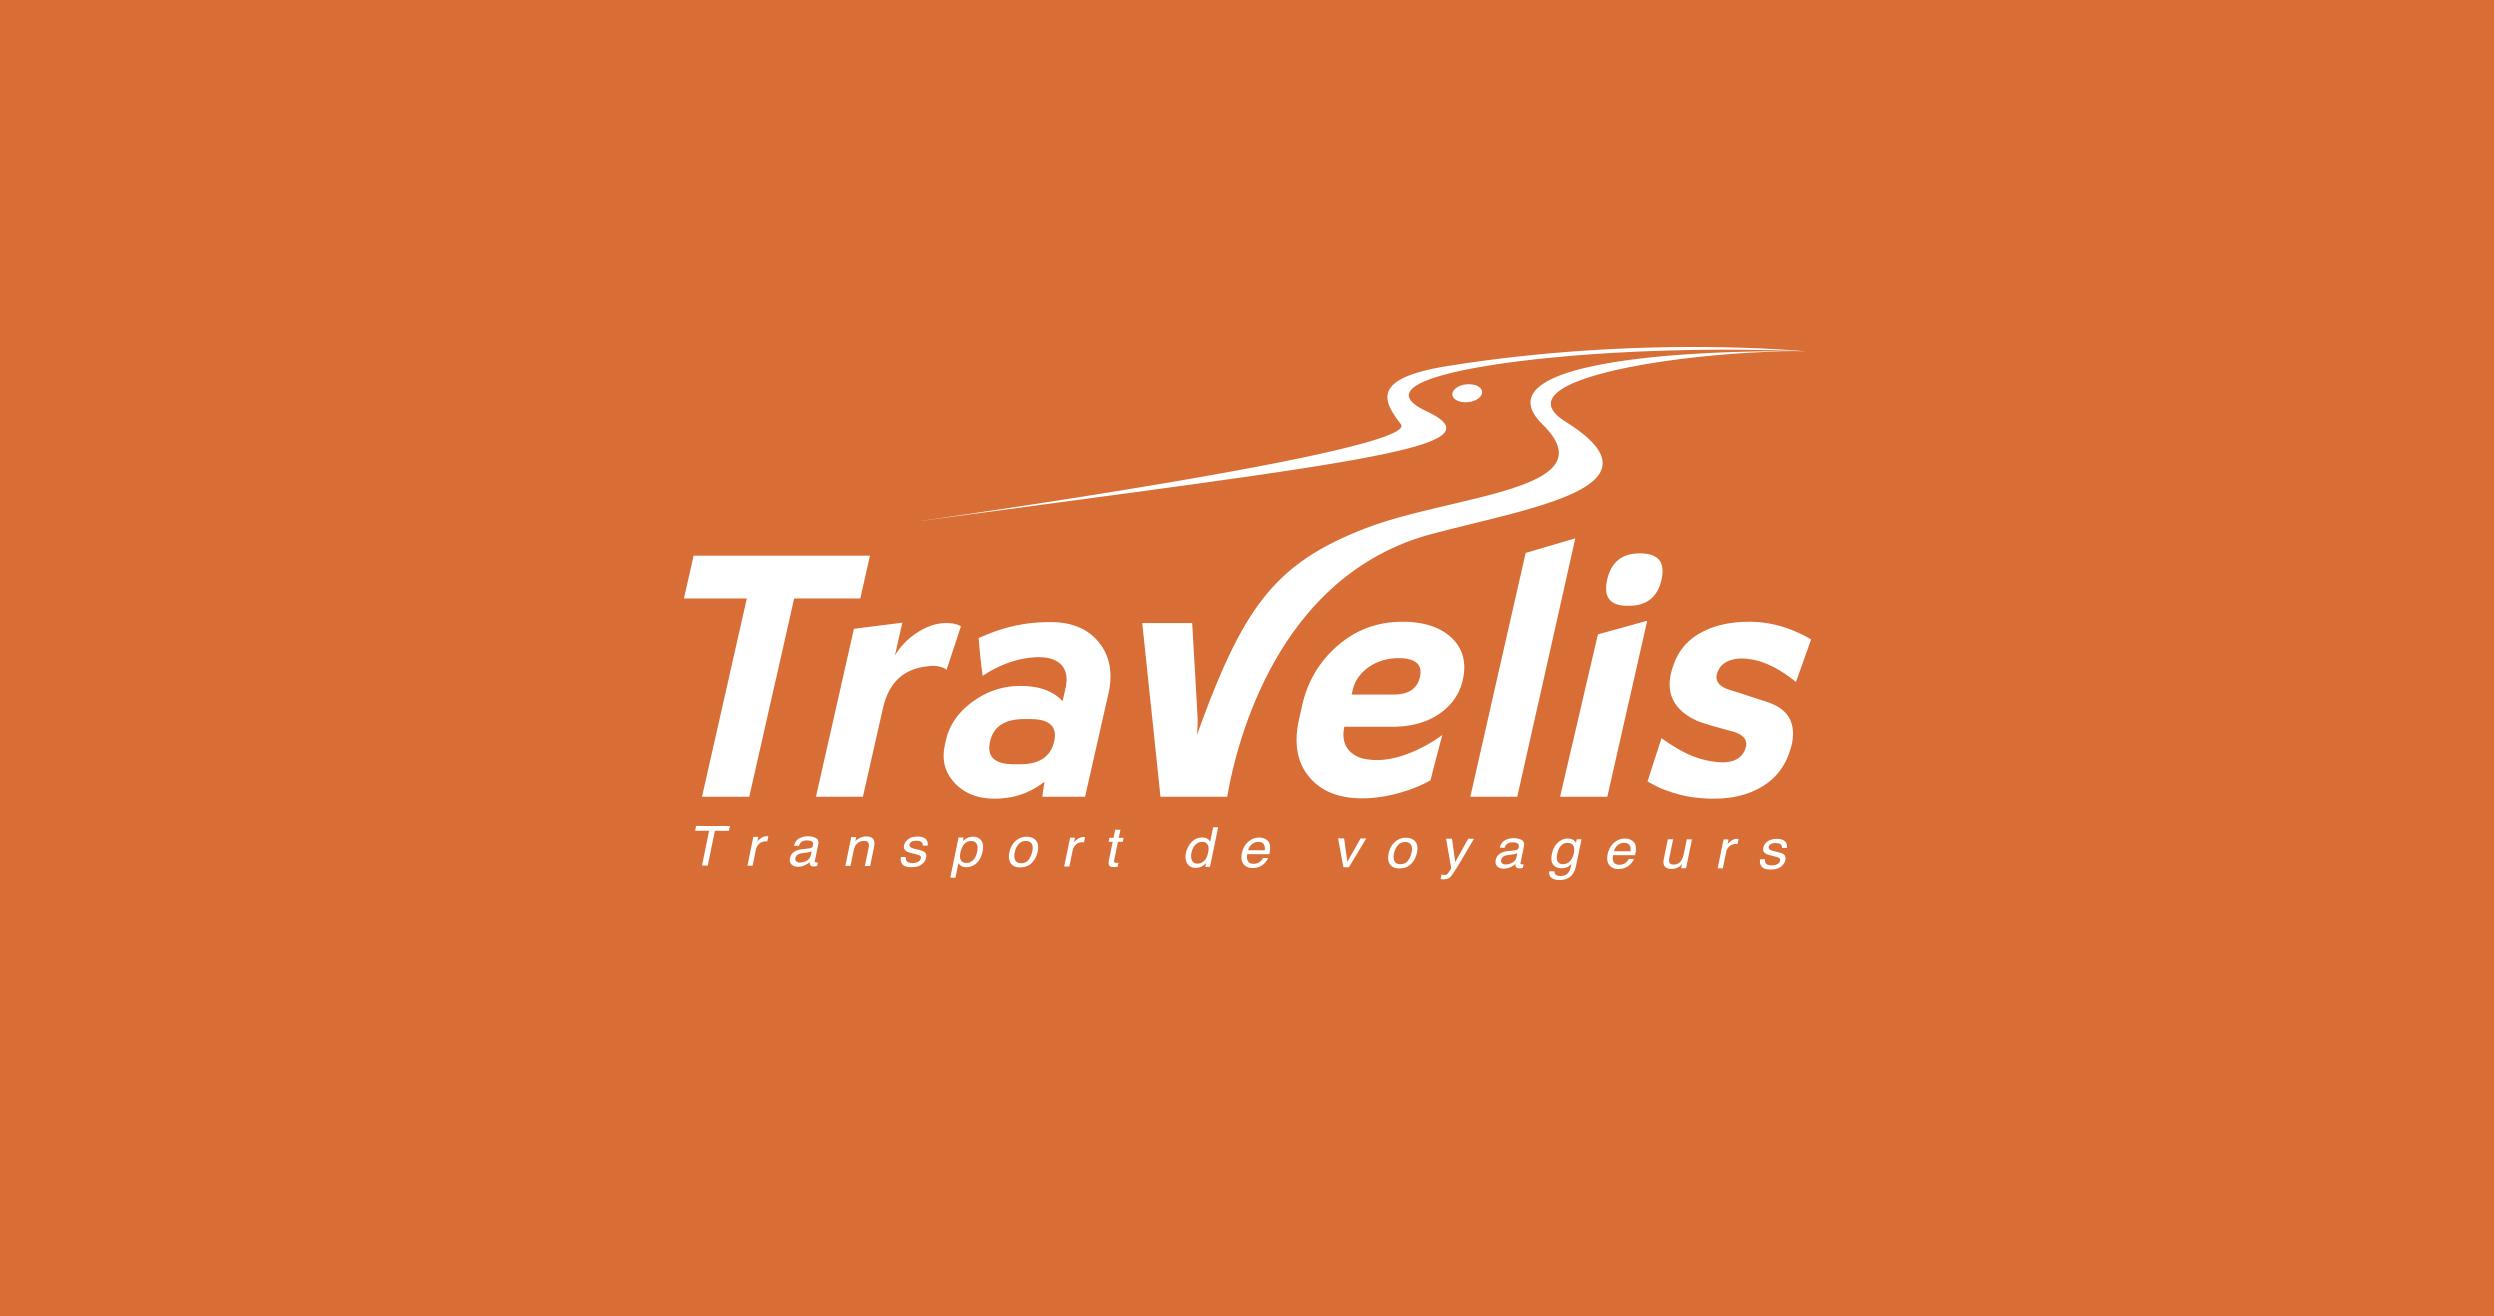 Logo de transport